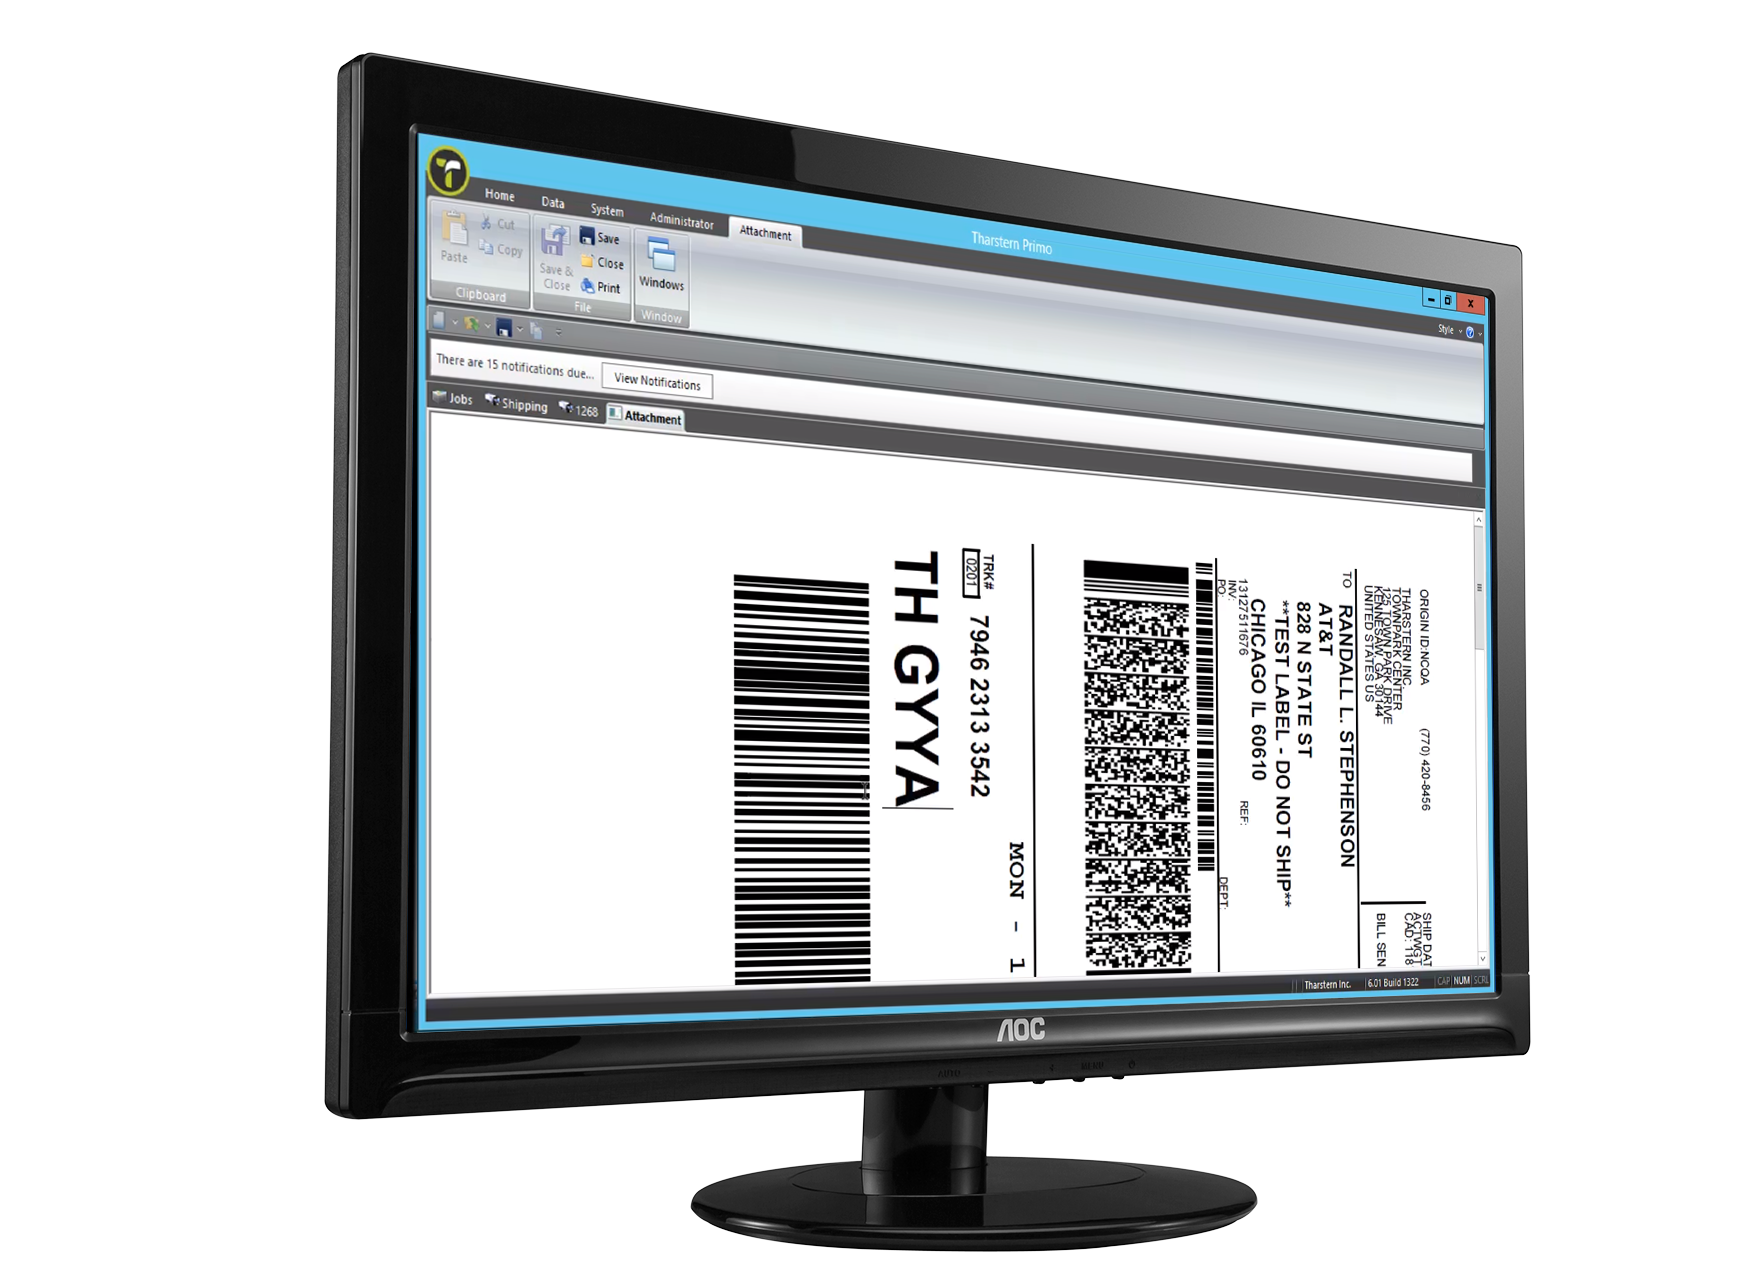 MIS integration FedEx screenshot on computer screen